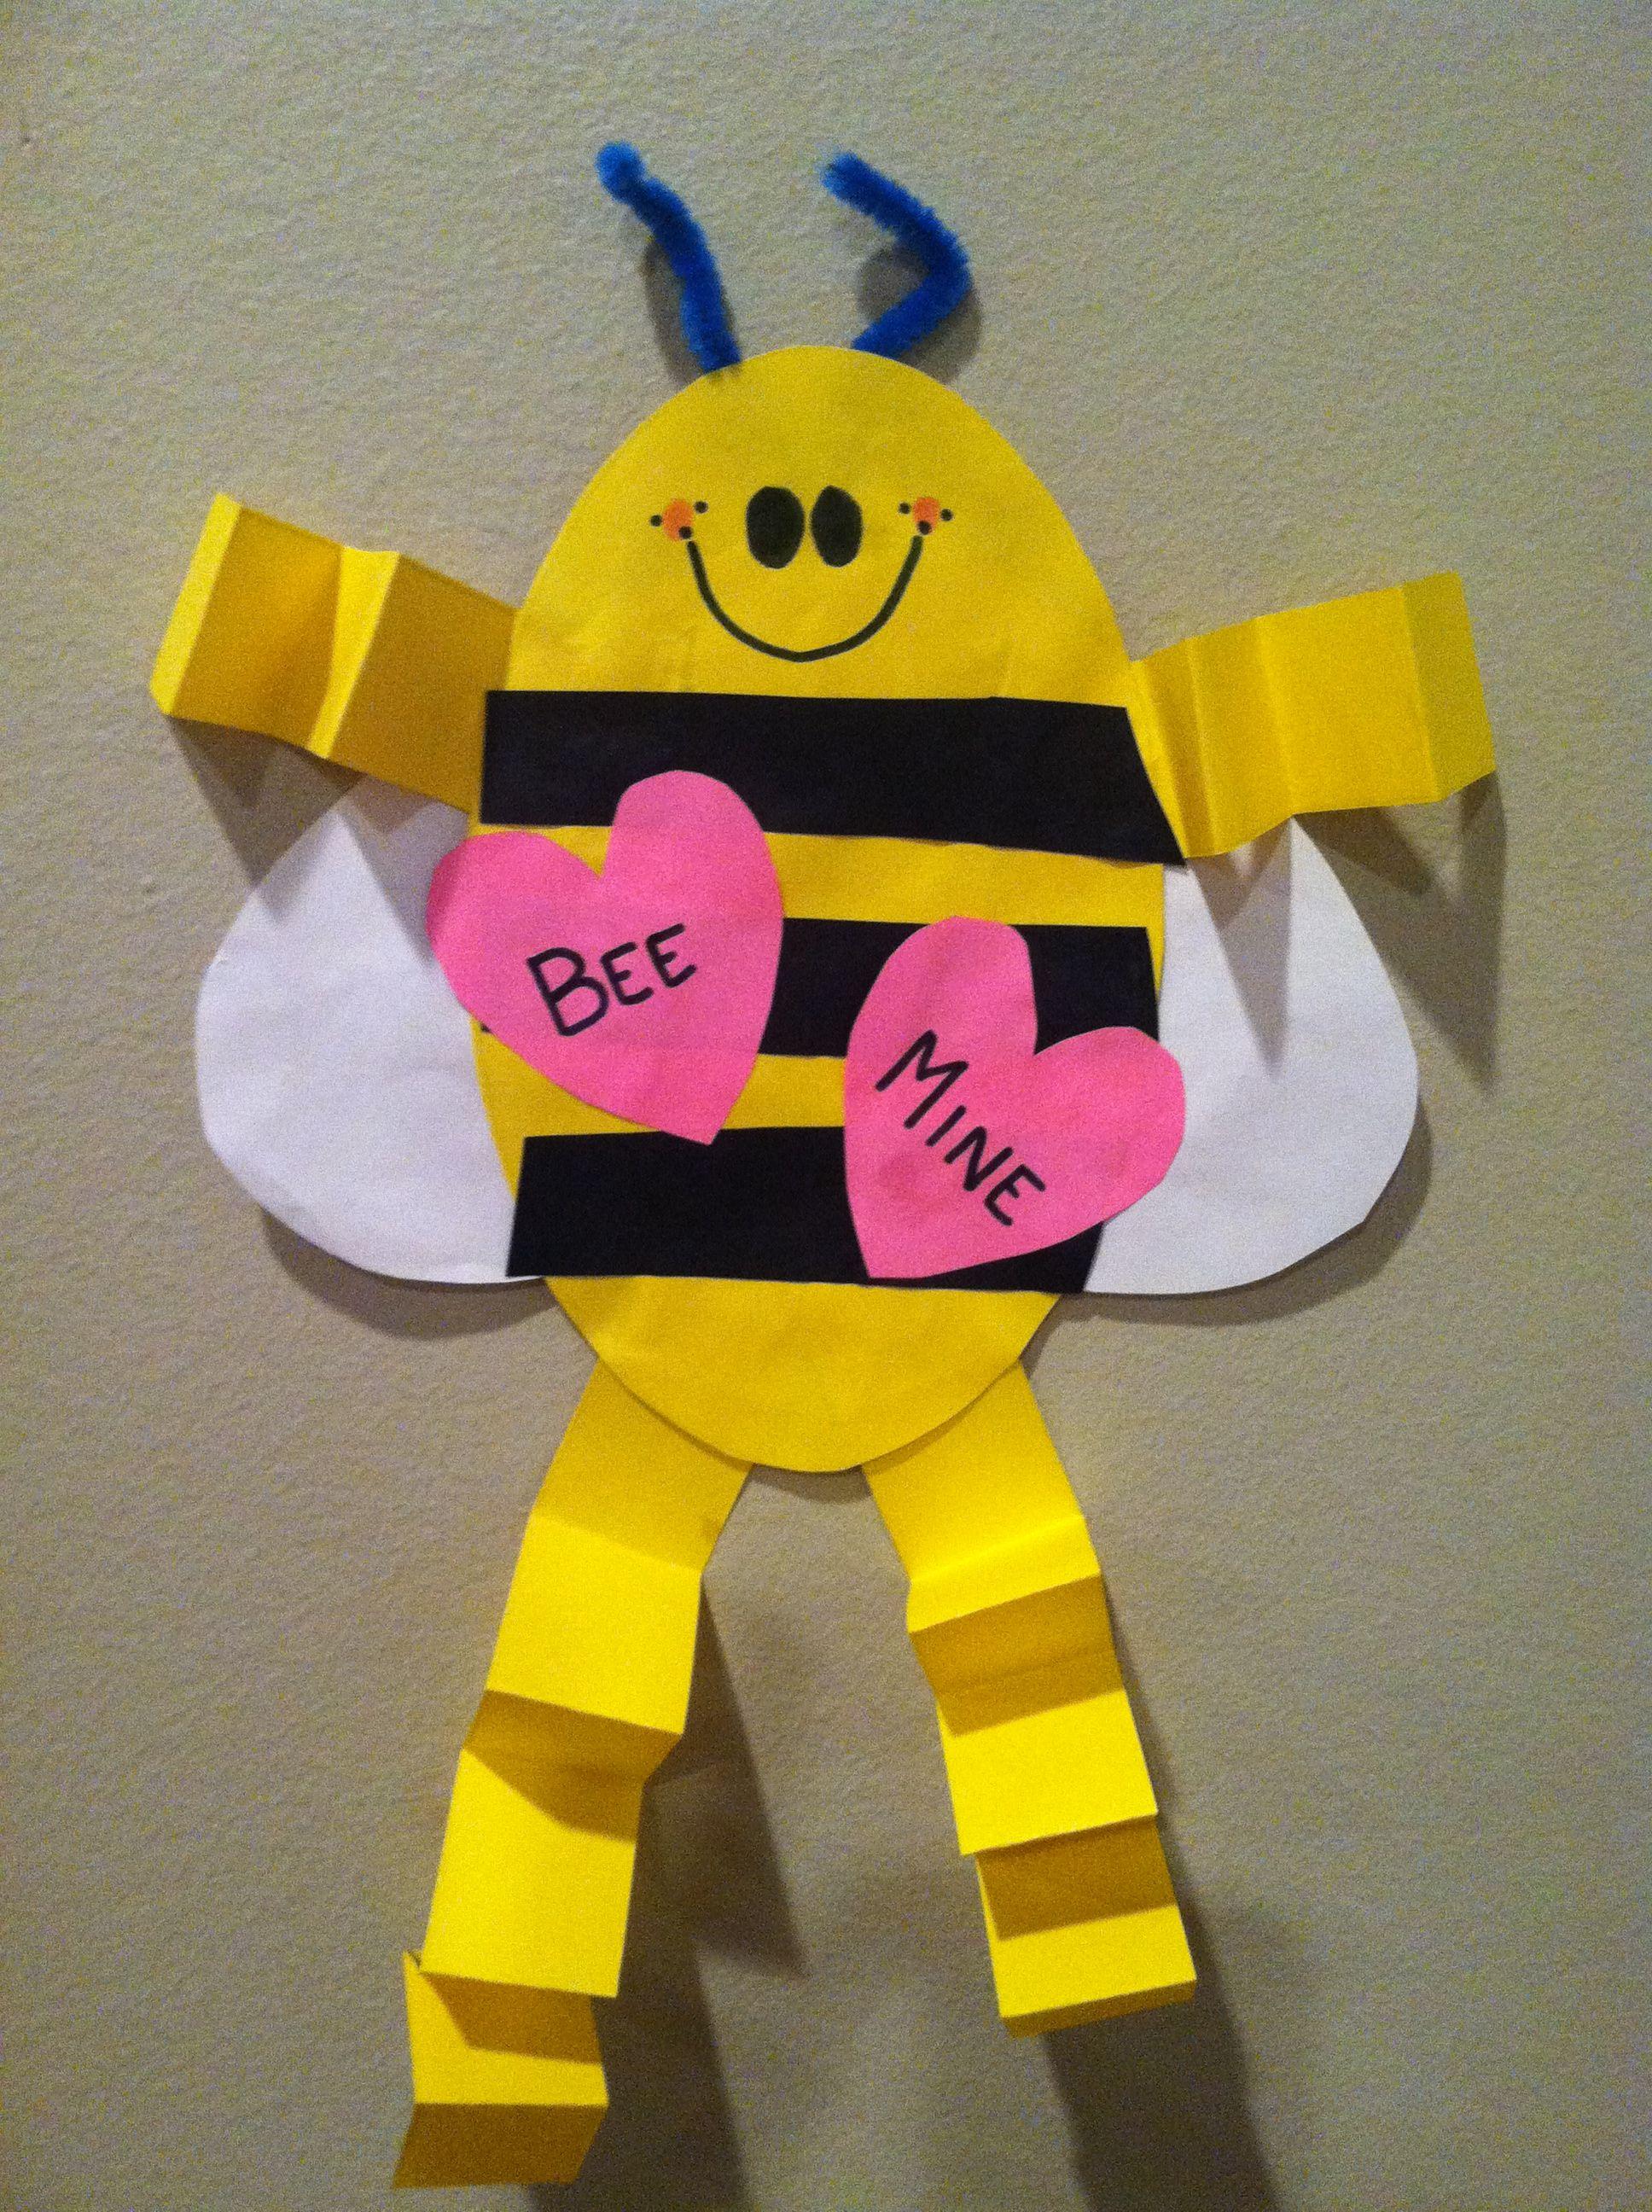 Valentine Bee Mine Craft In Preschool And Pre K